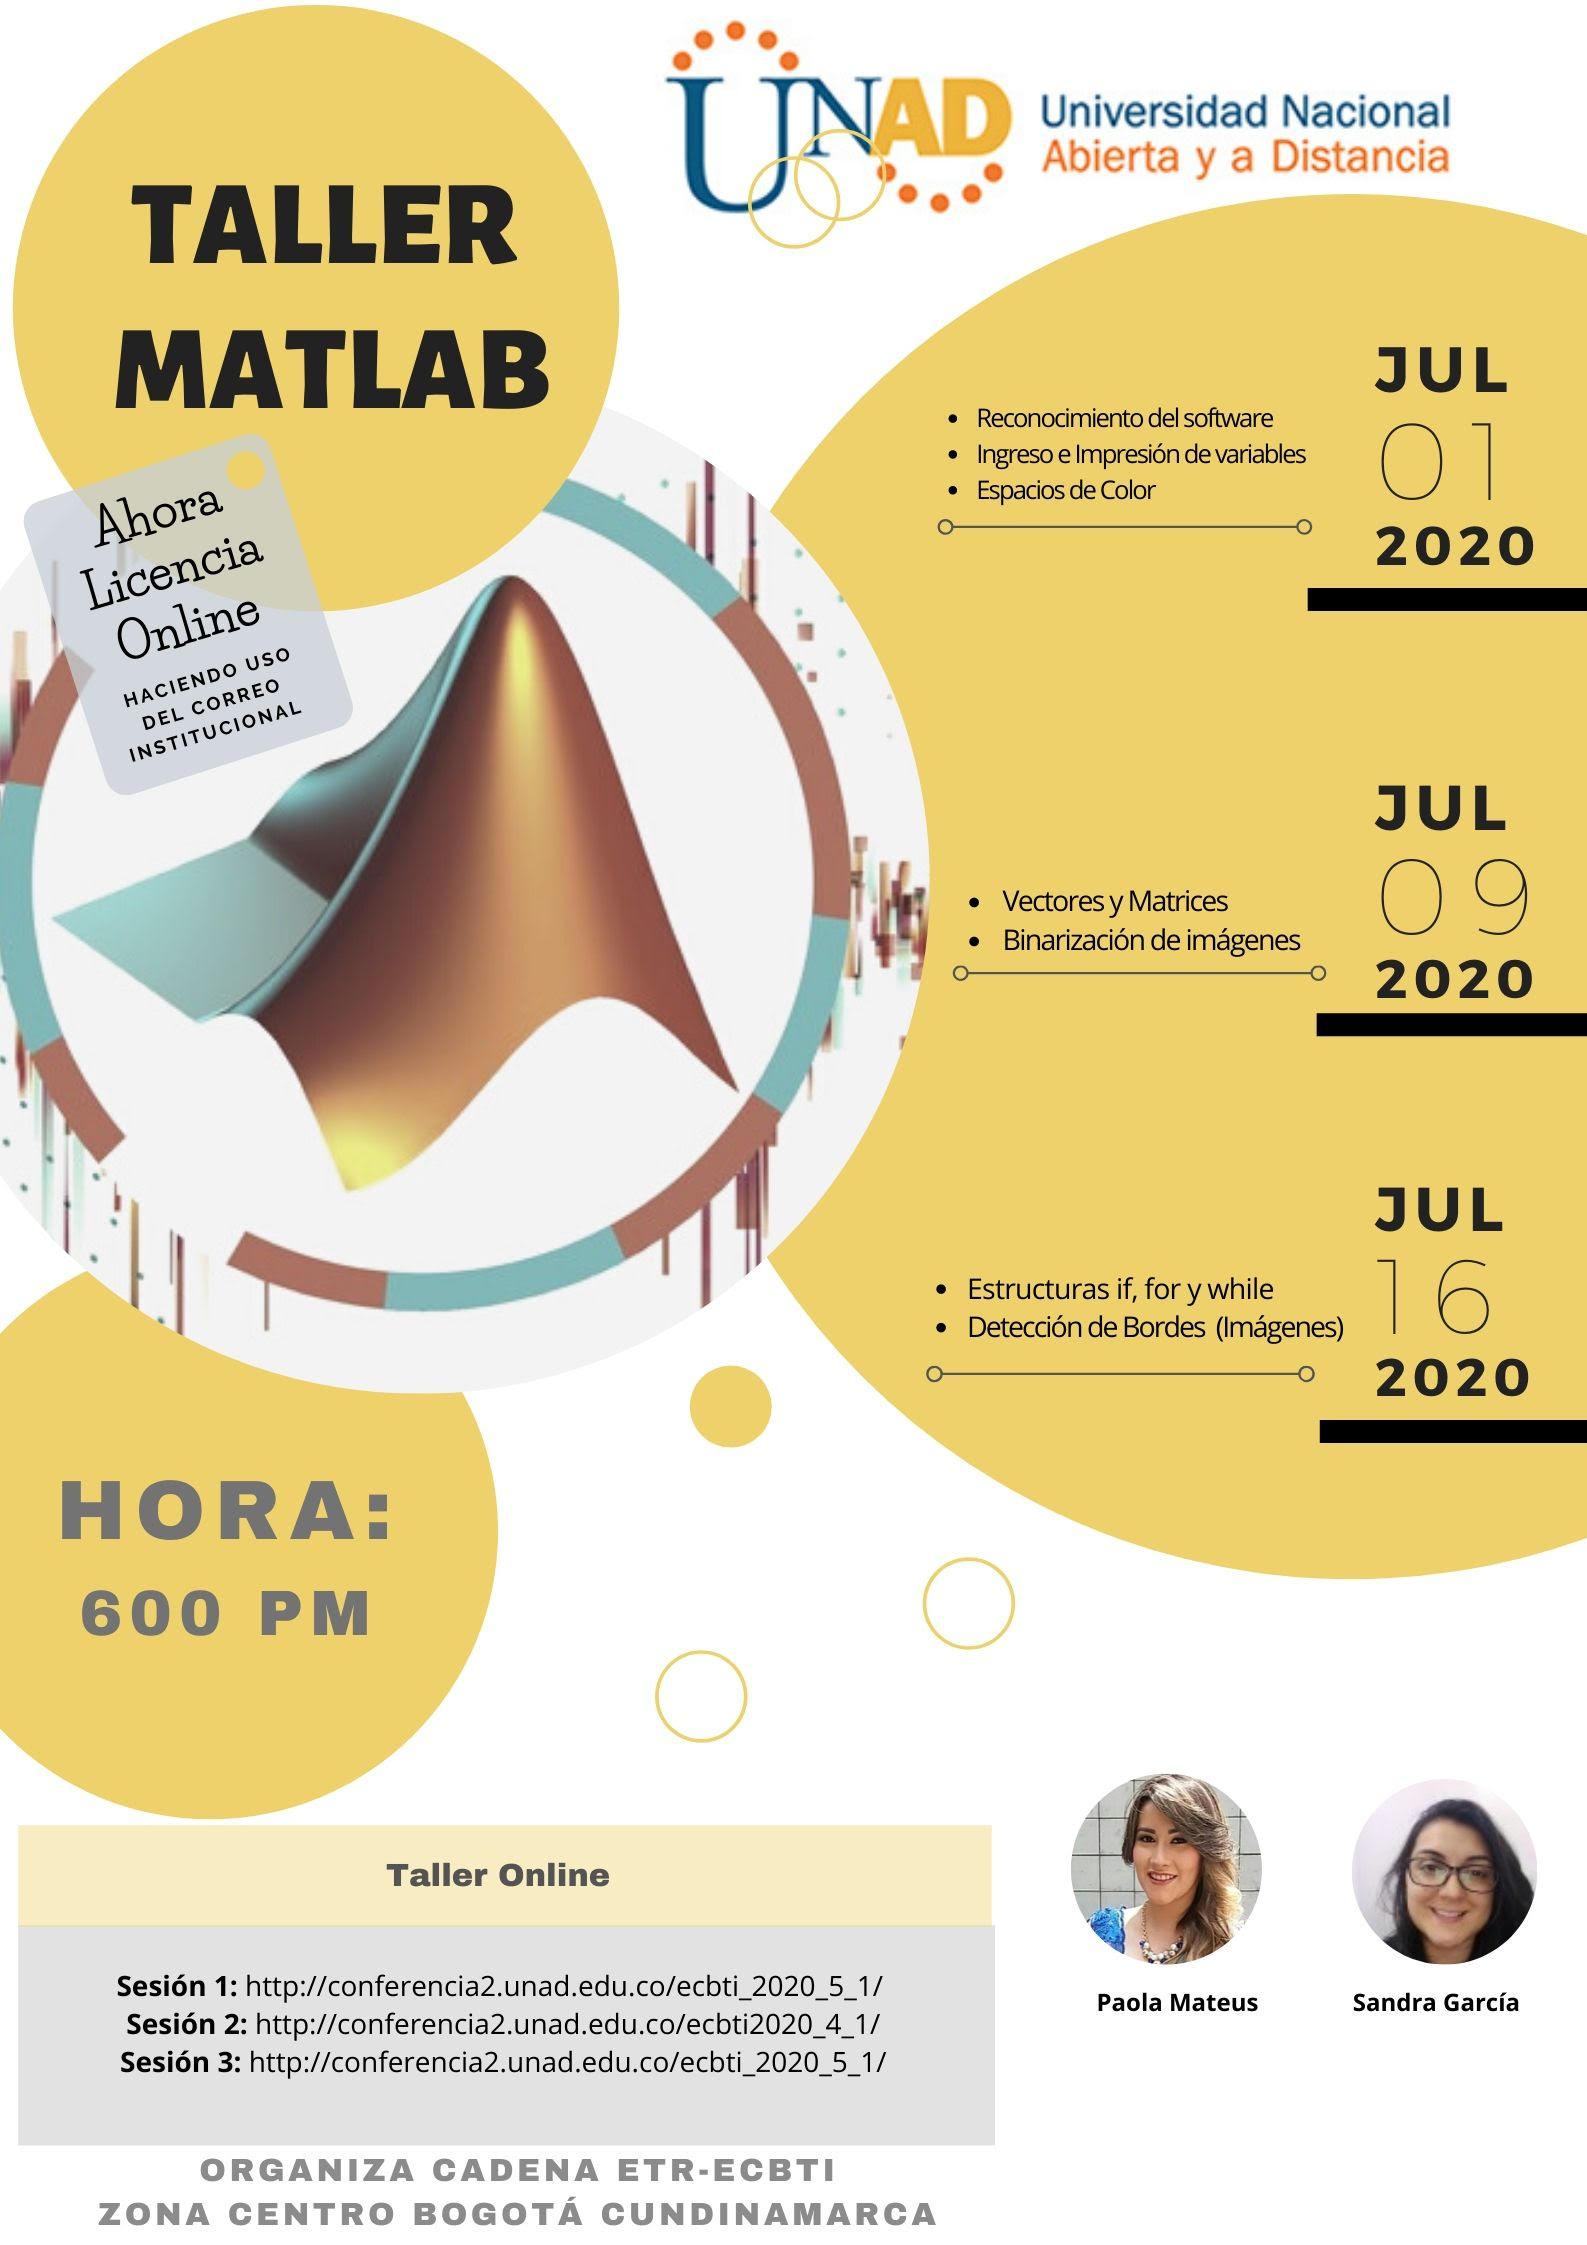 taller Matlab julio 2020